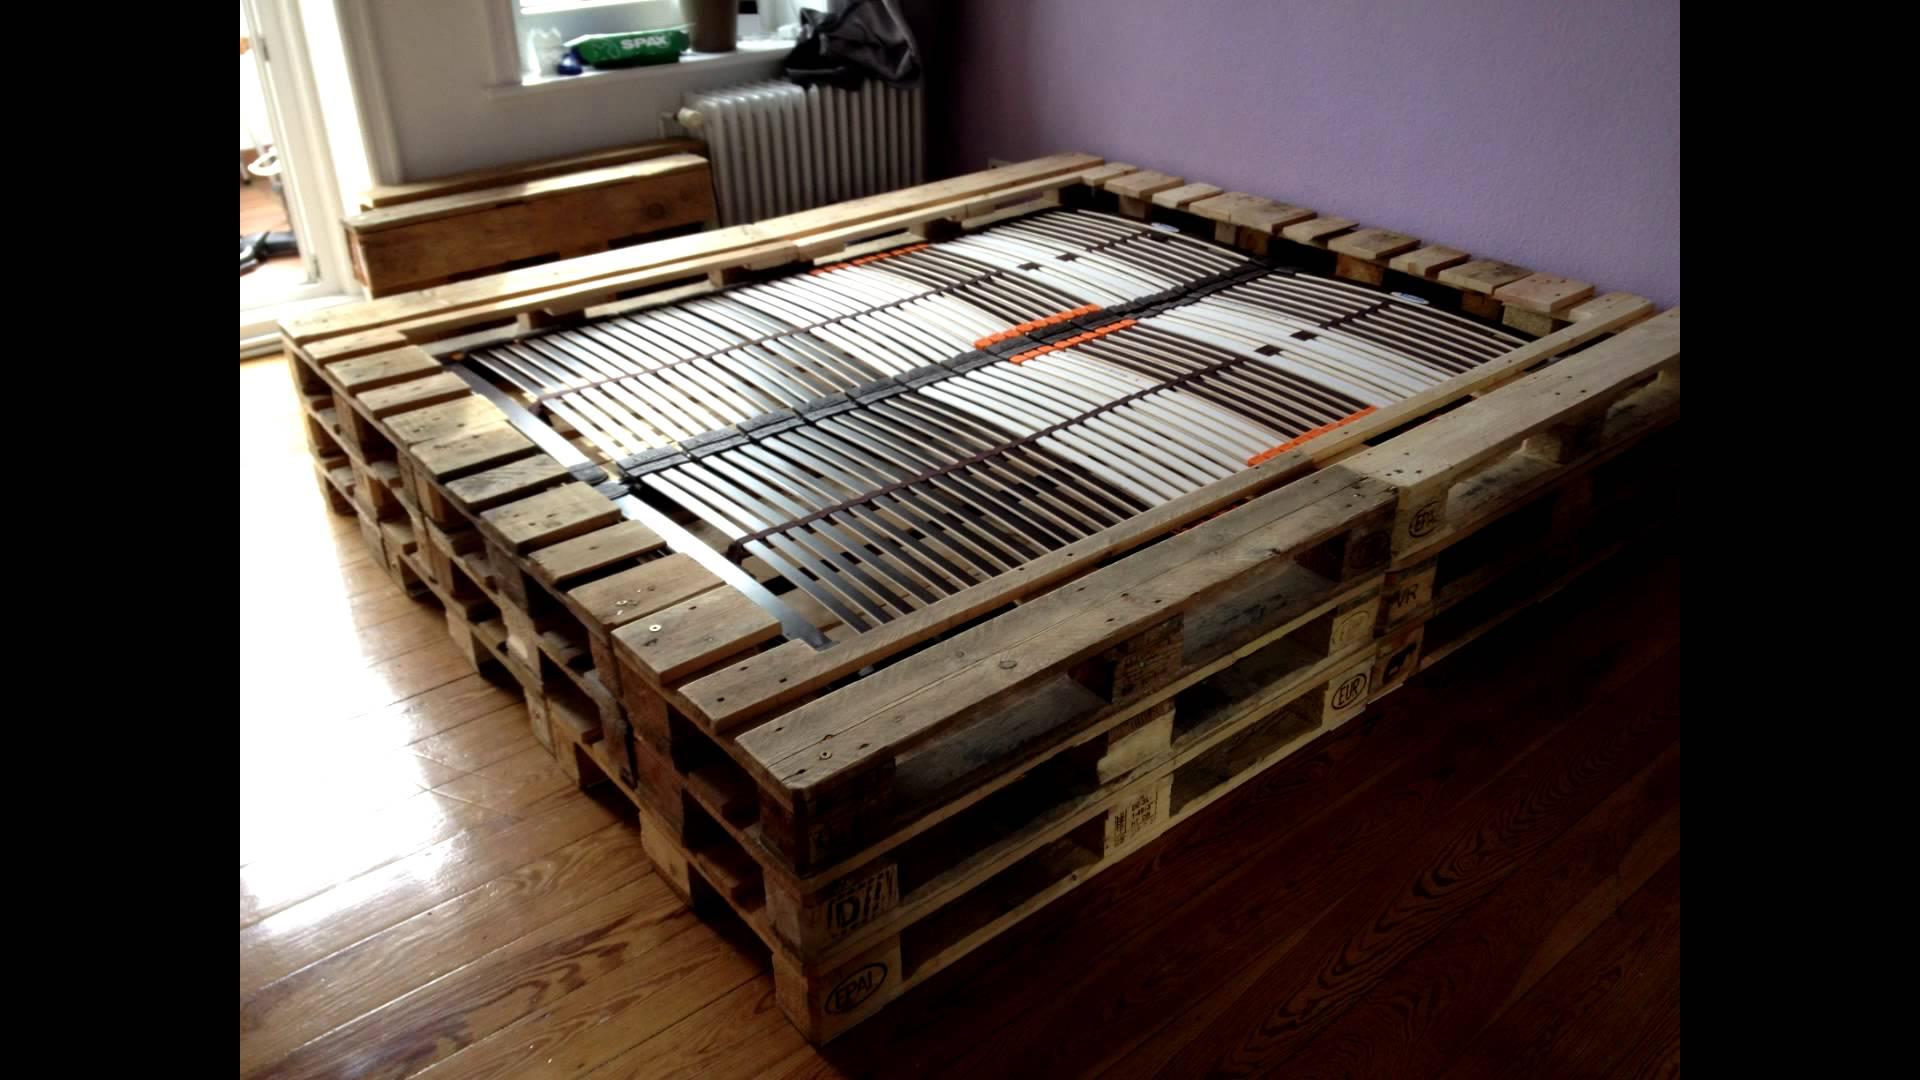 europaletten legen wo kann ich so etwas kaufen bett selfmade. Black Bedroom Furniture Sets. Home Design Ideas